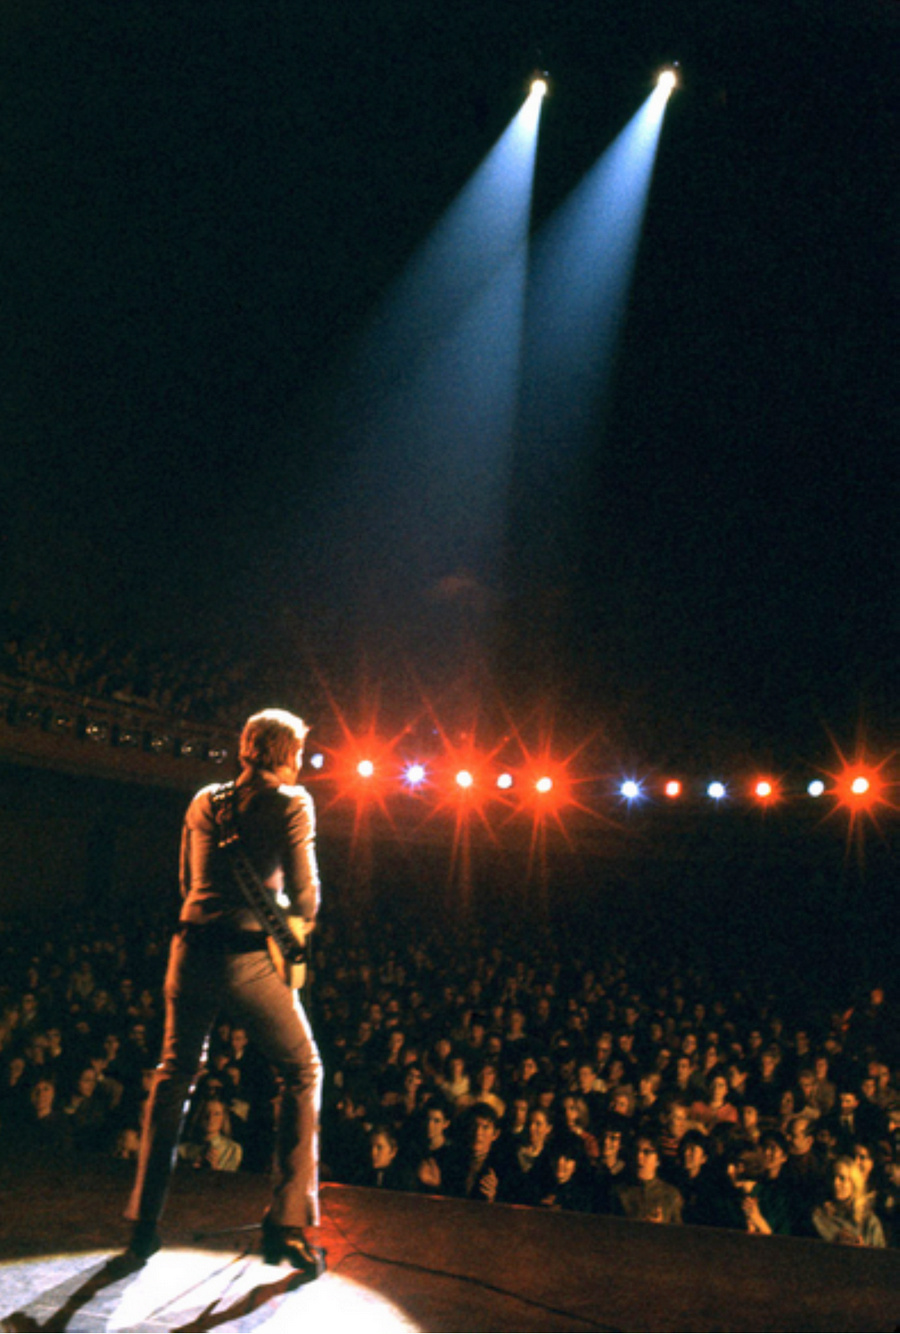 LES CONCERTS DE JOHNNY 'OLYMPIA DE PARIS 1967' Captur55